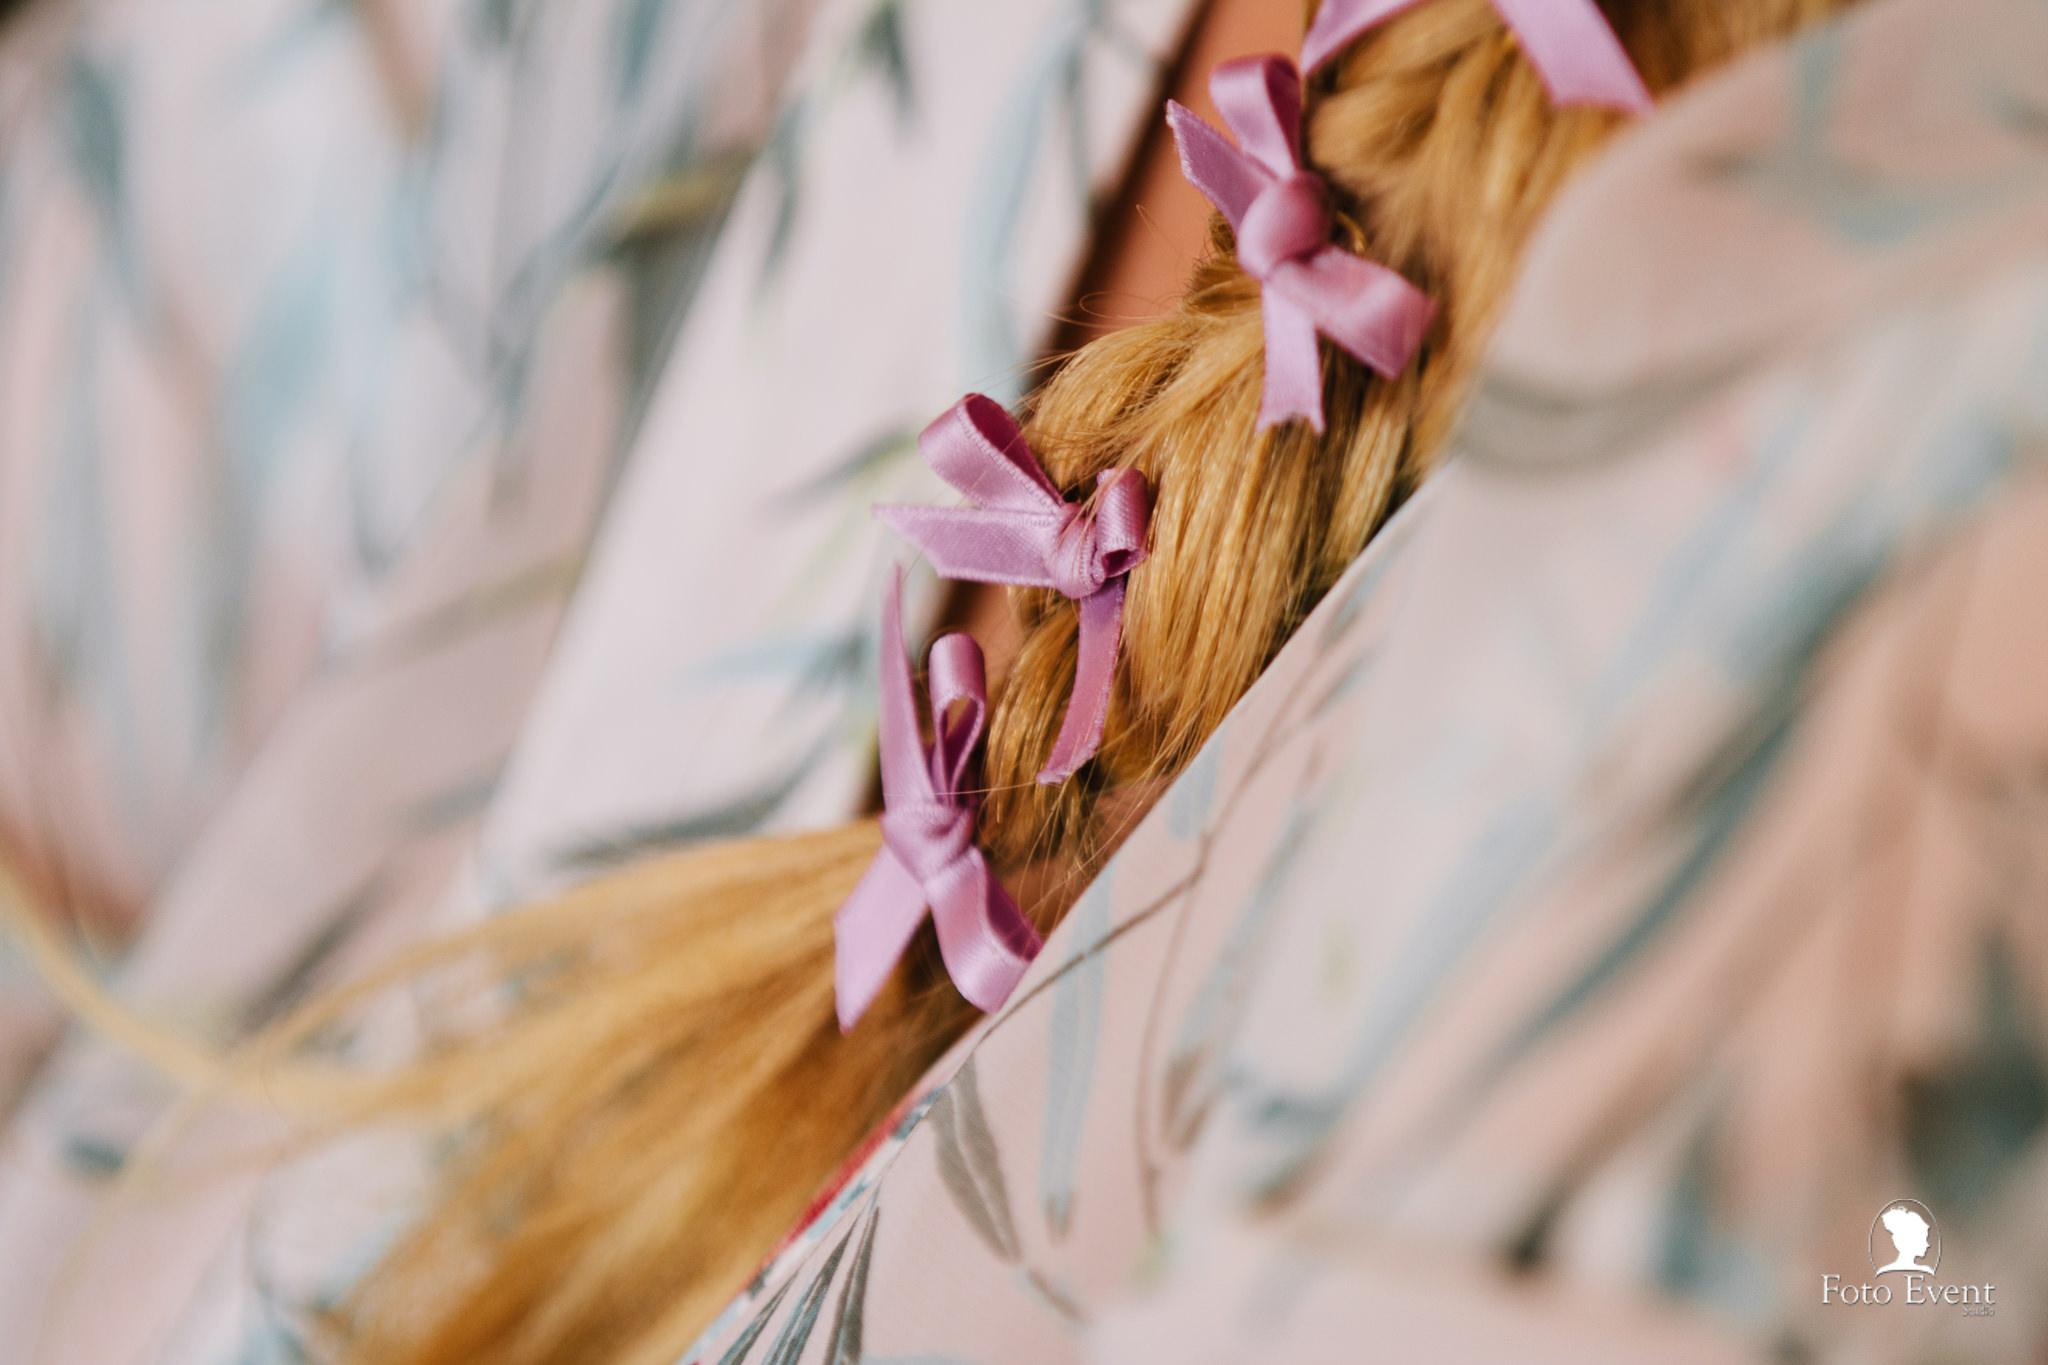 021-2019-07-27-Matrimonio-Valentina-e-Alessandro-Pettinari-zoom-124